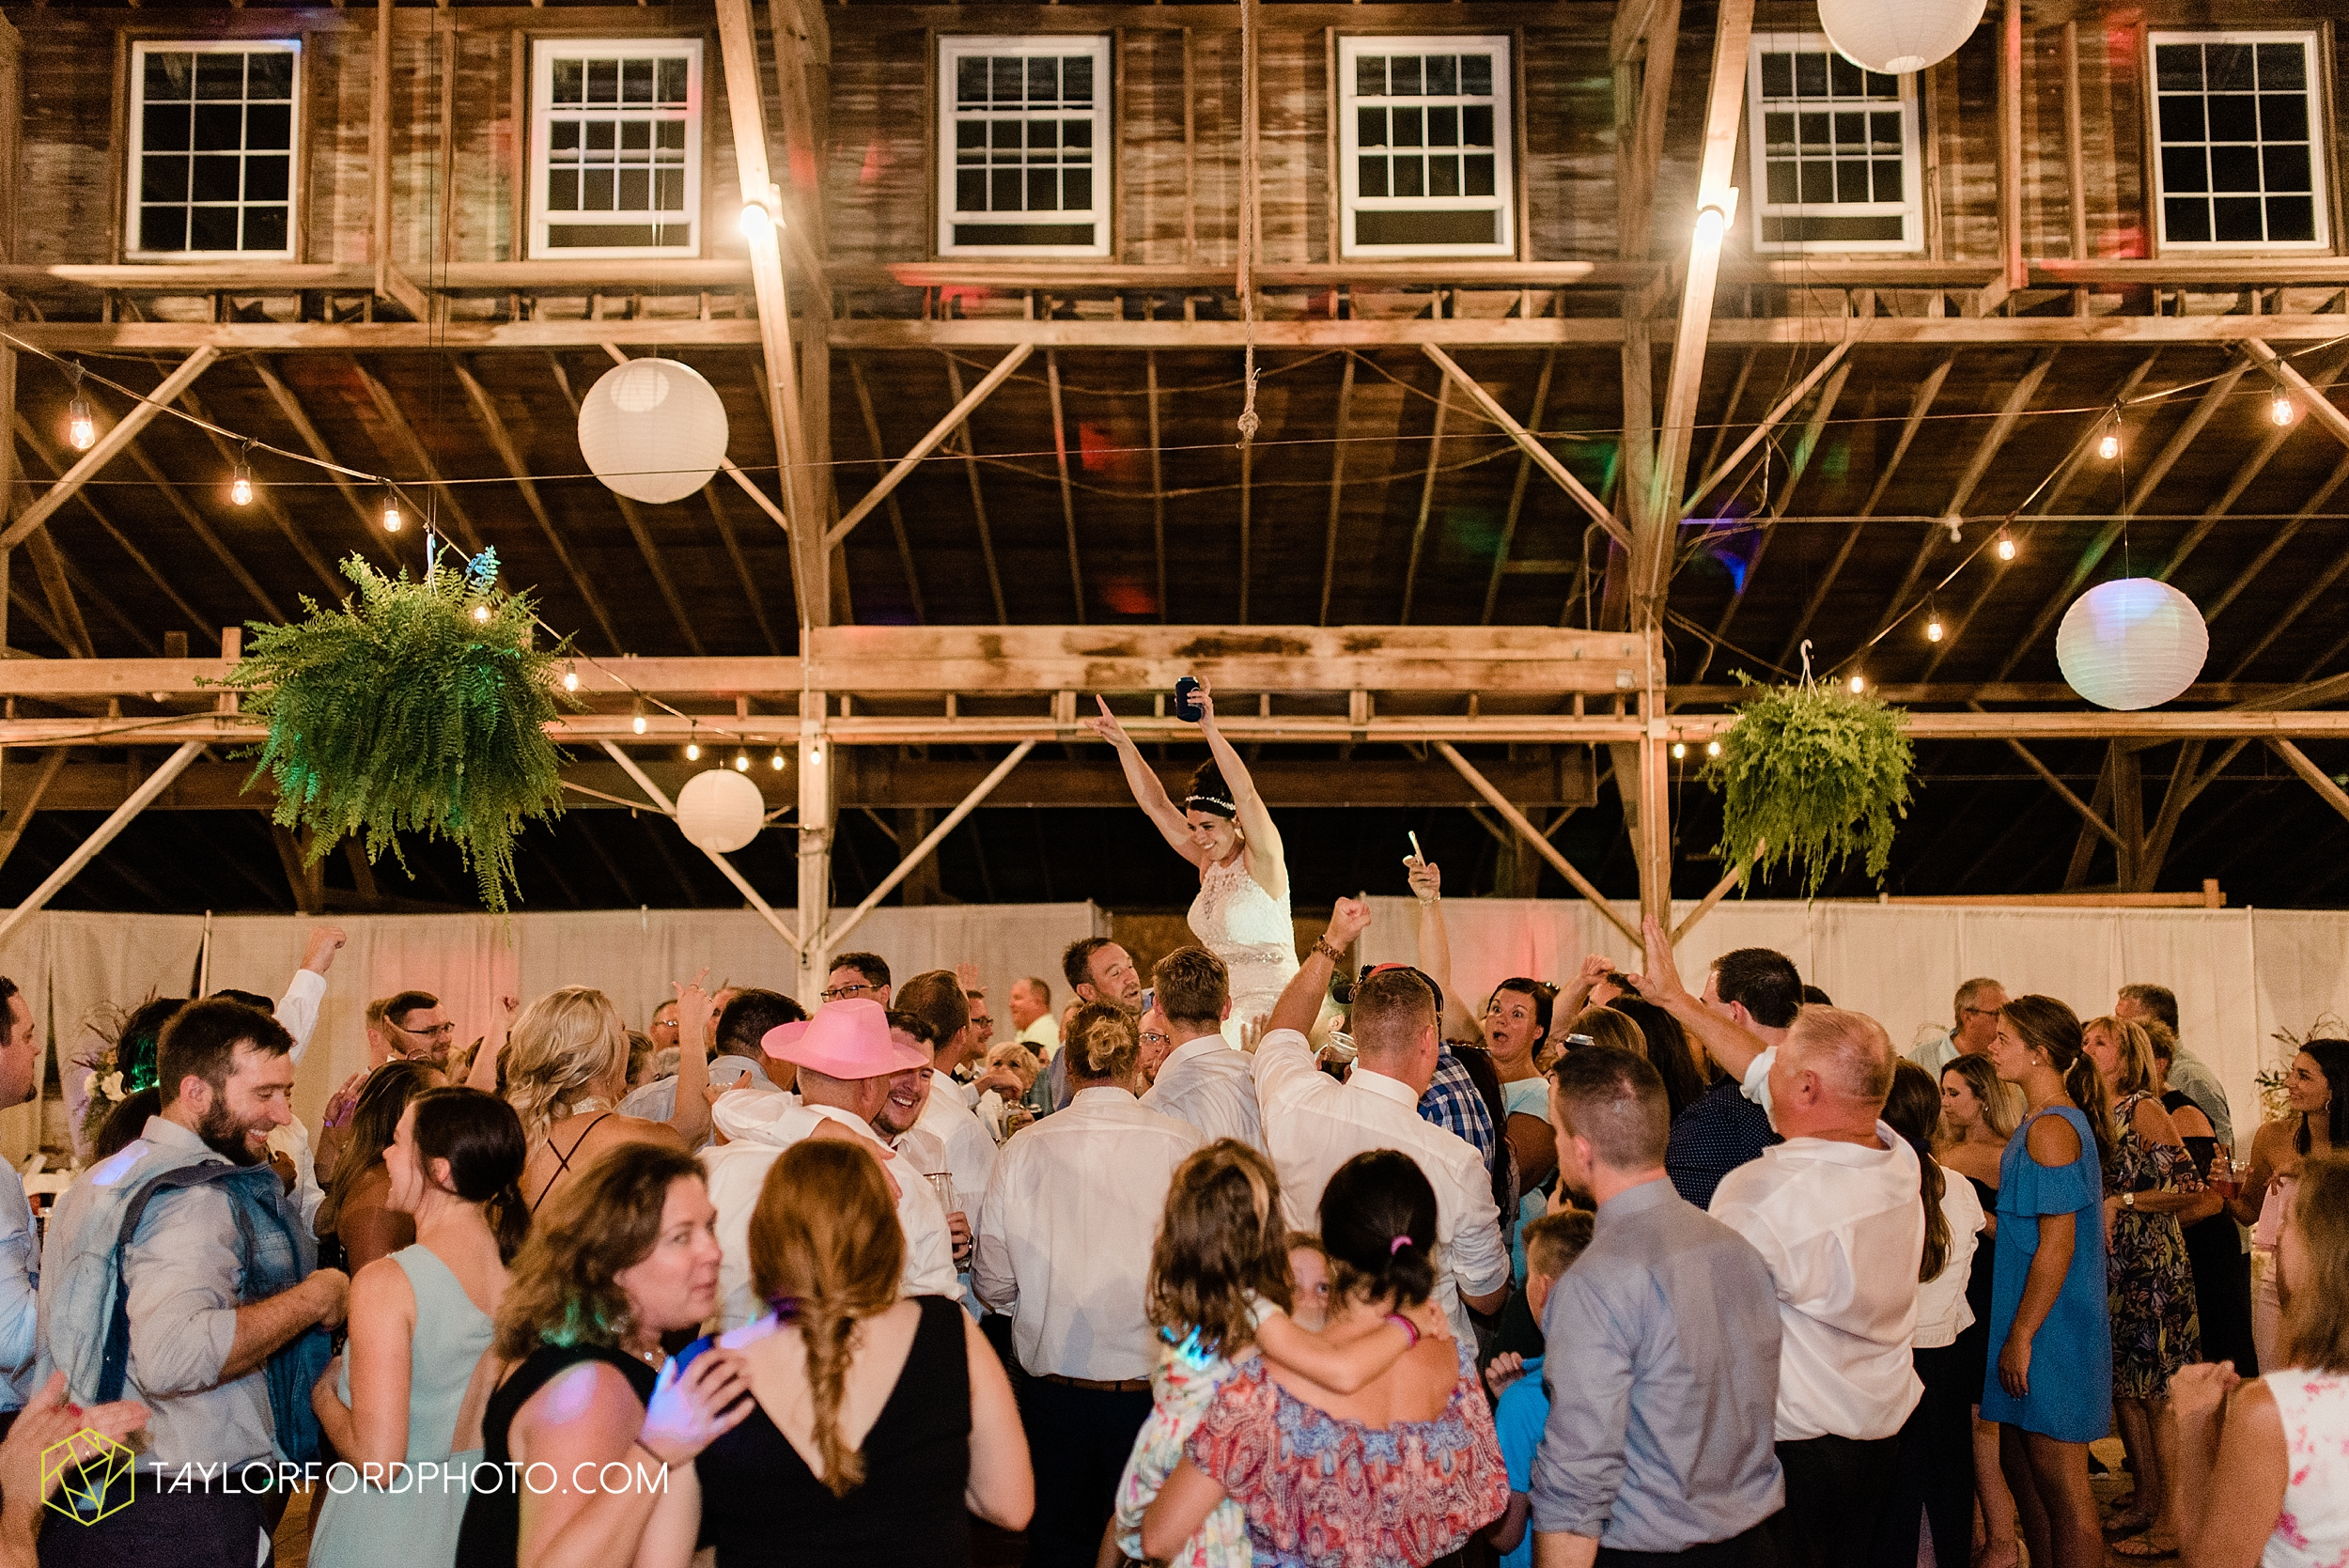 van-wert-ohio-first-united-methodist-church-county-dairy-barn-wedding-photographer-taylor-ford-photography_9891.jpg